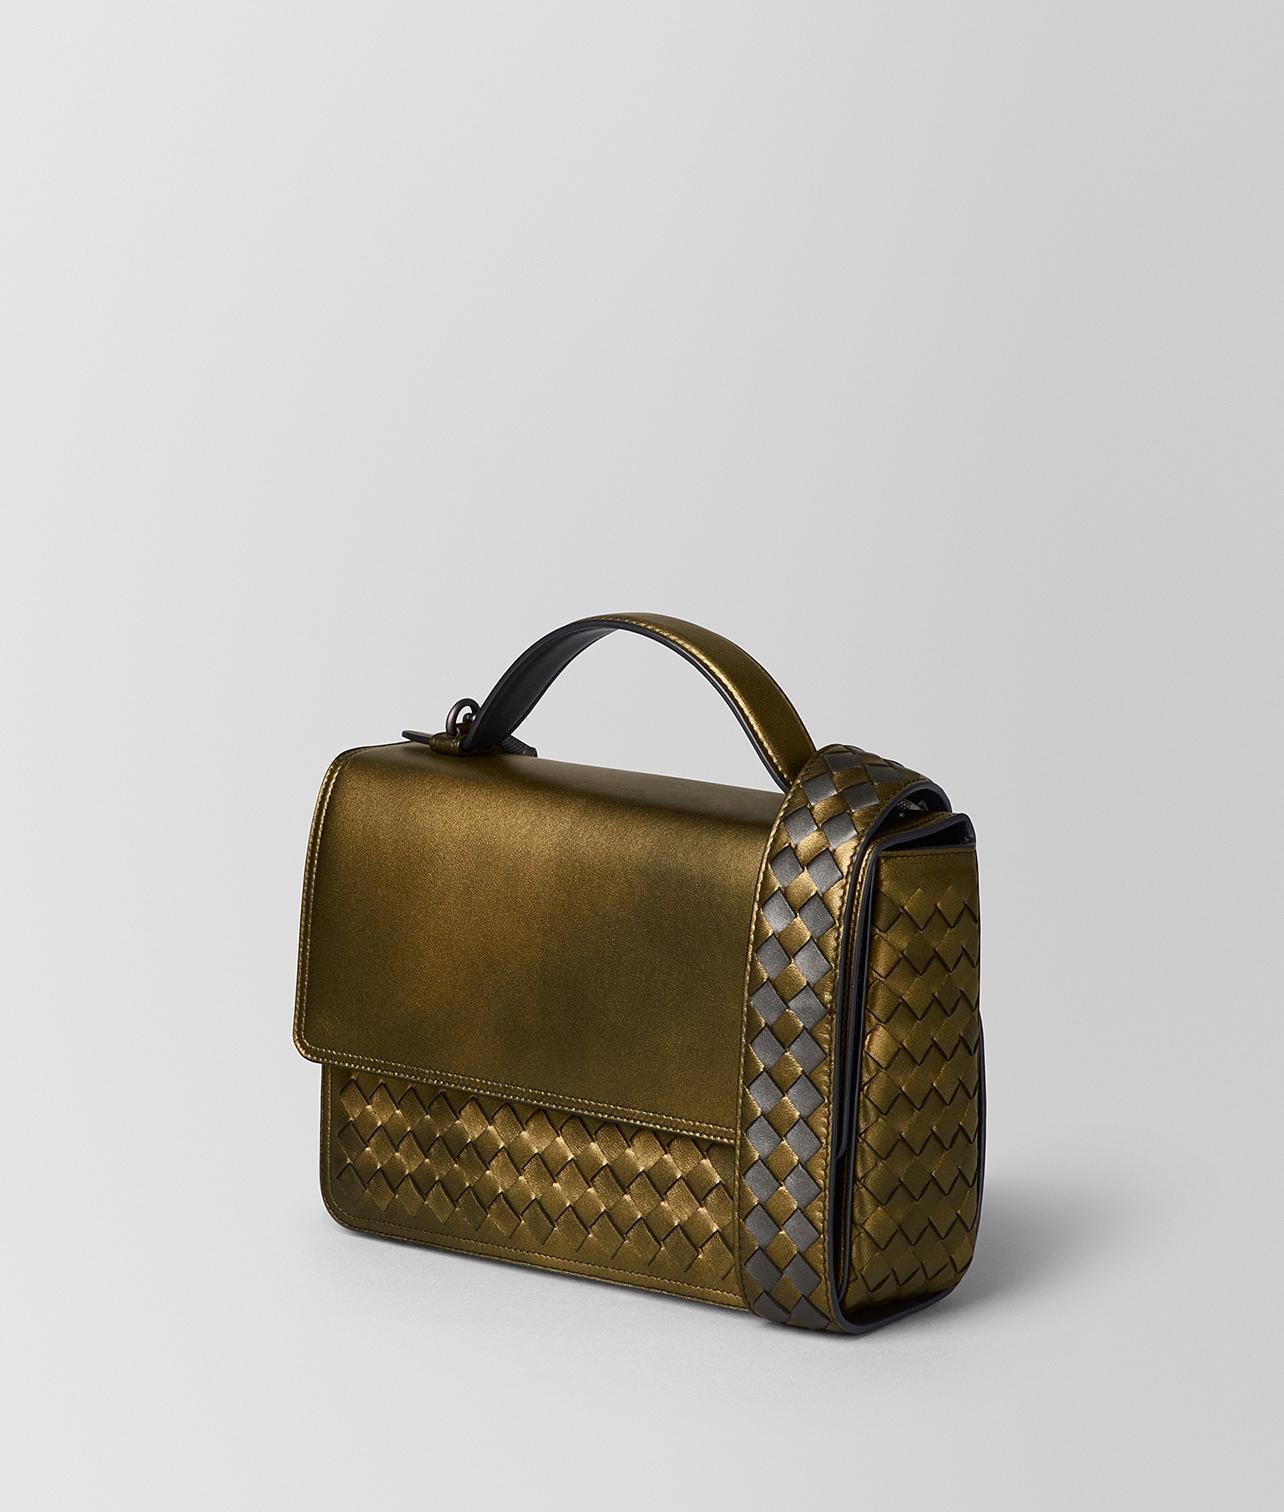 Lyst - Bottega Veneta Dark Gold Intrecciato Nappa Alumna Bag in Metallic eeca537742583